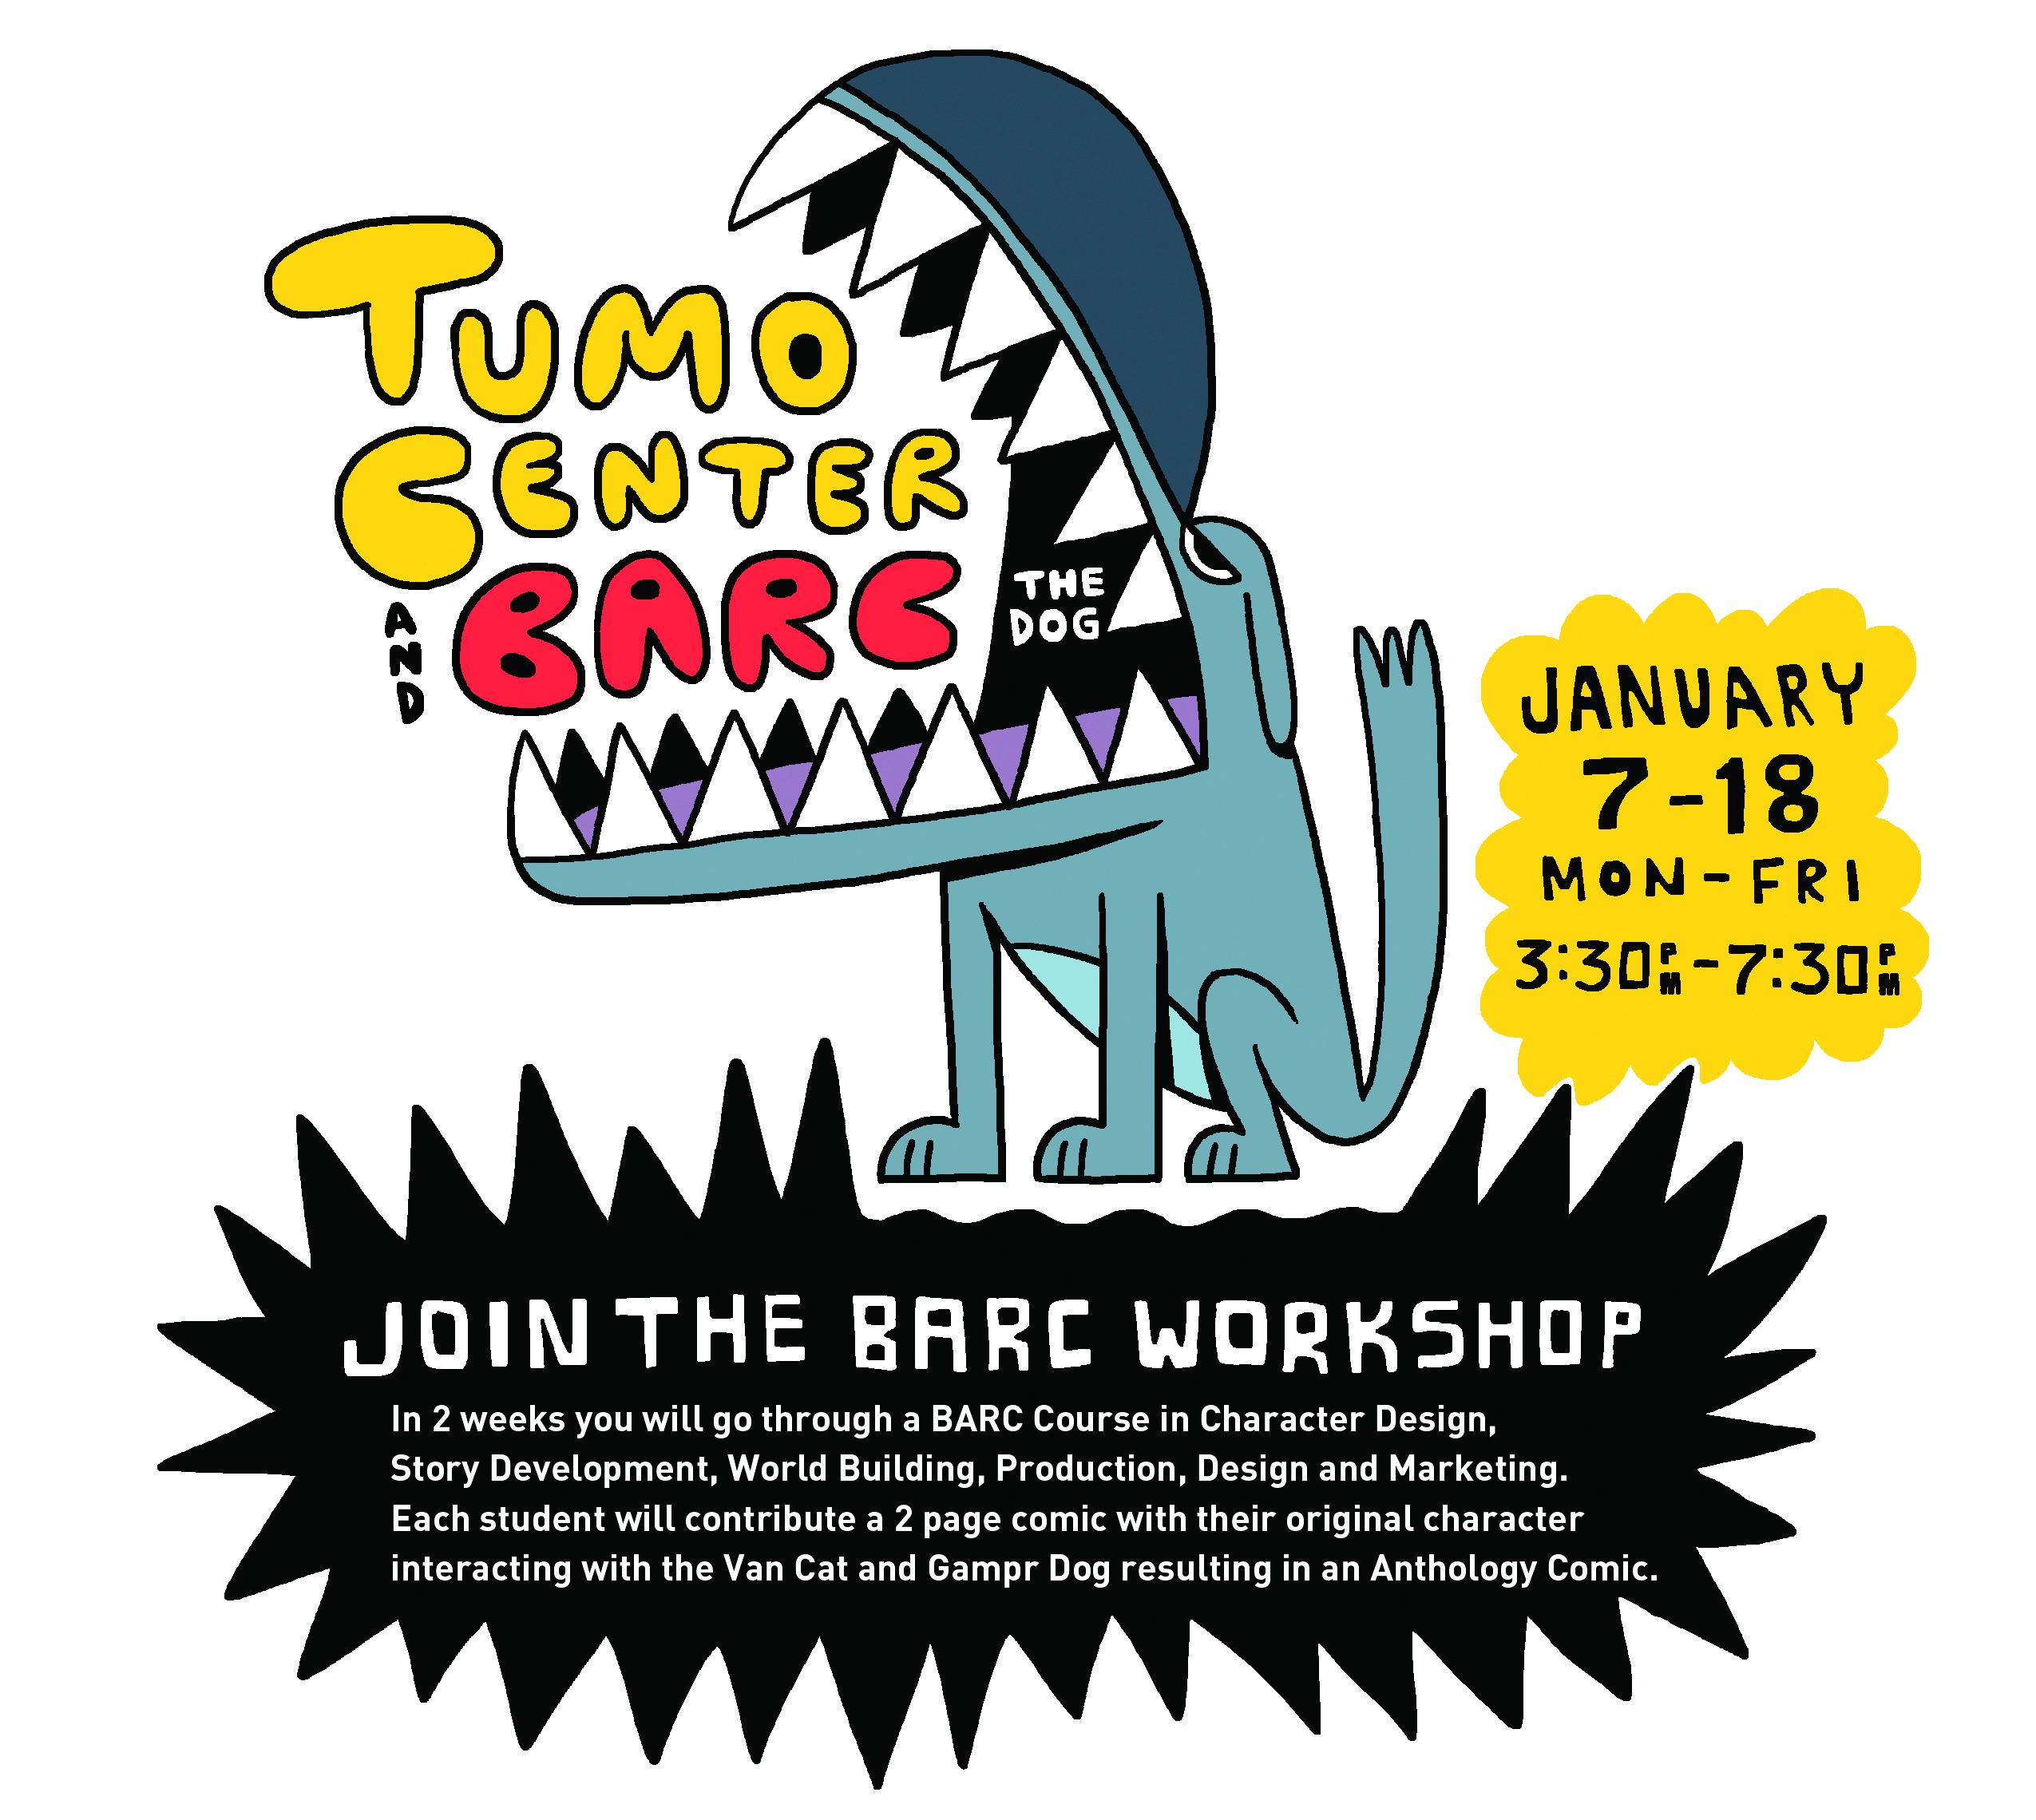 cropped site - BARC The Dog-ը Թումոյում